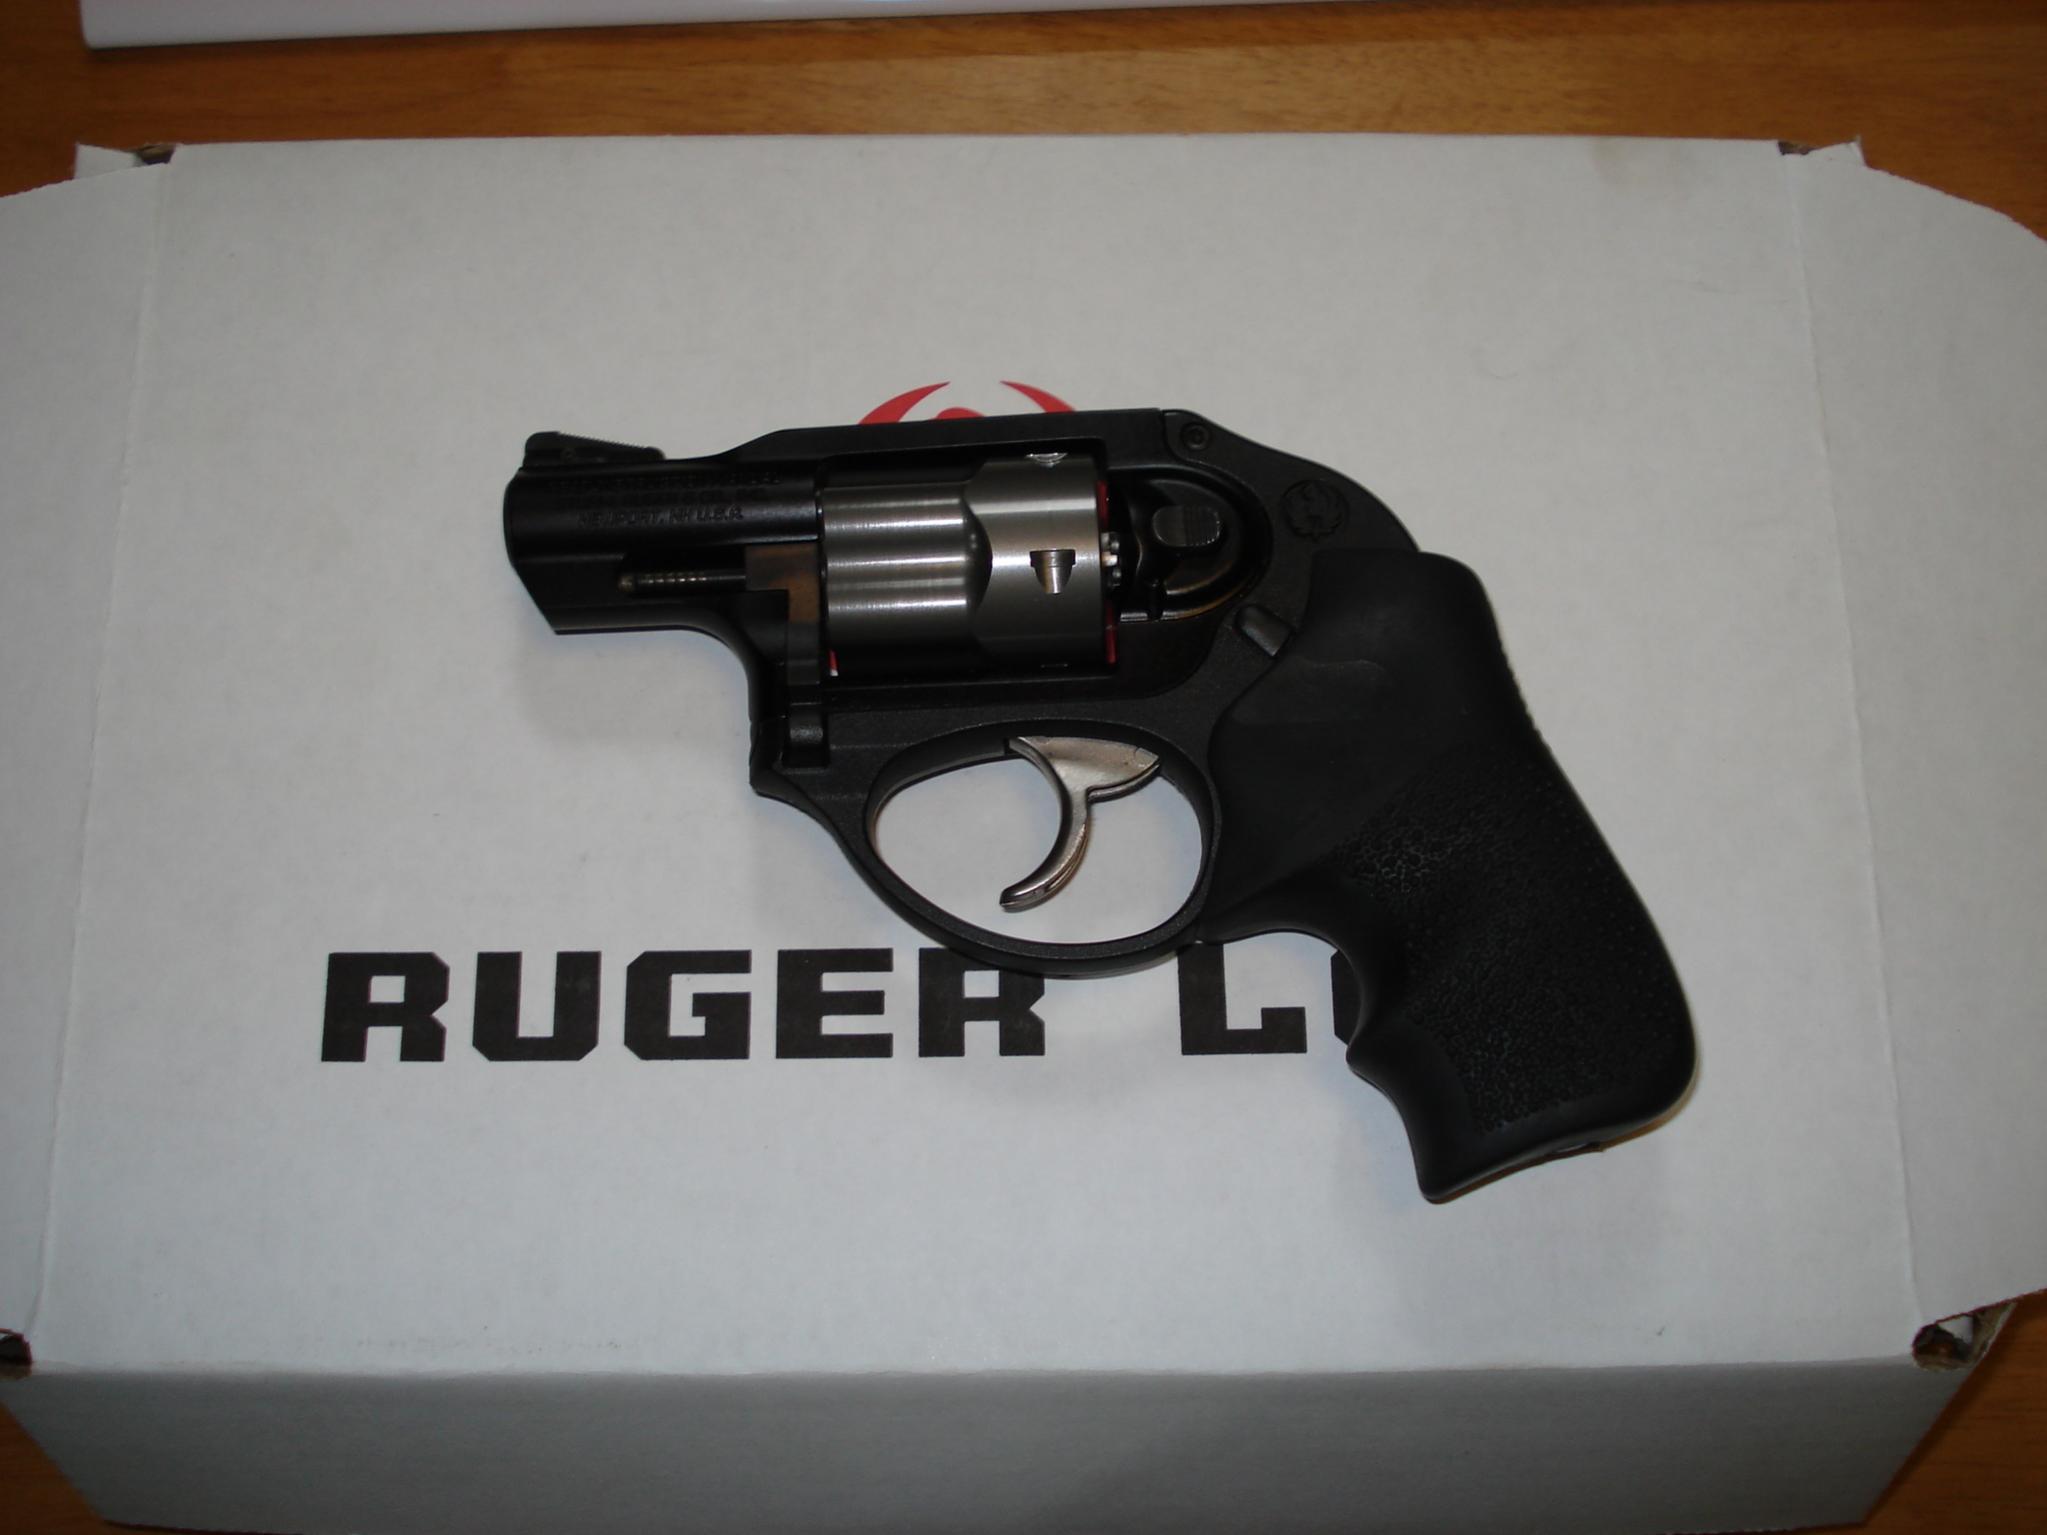 RUGER LCR Club-dsc00673.jpg